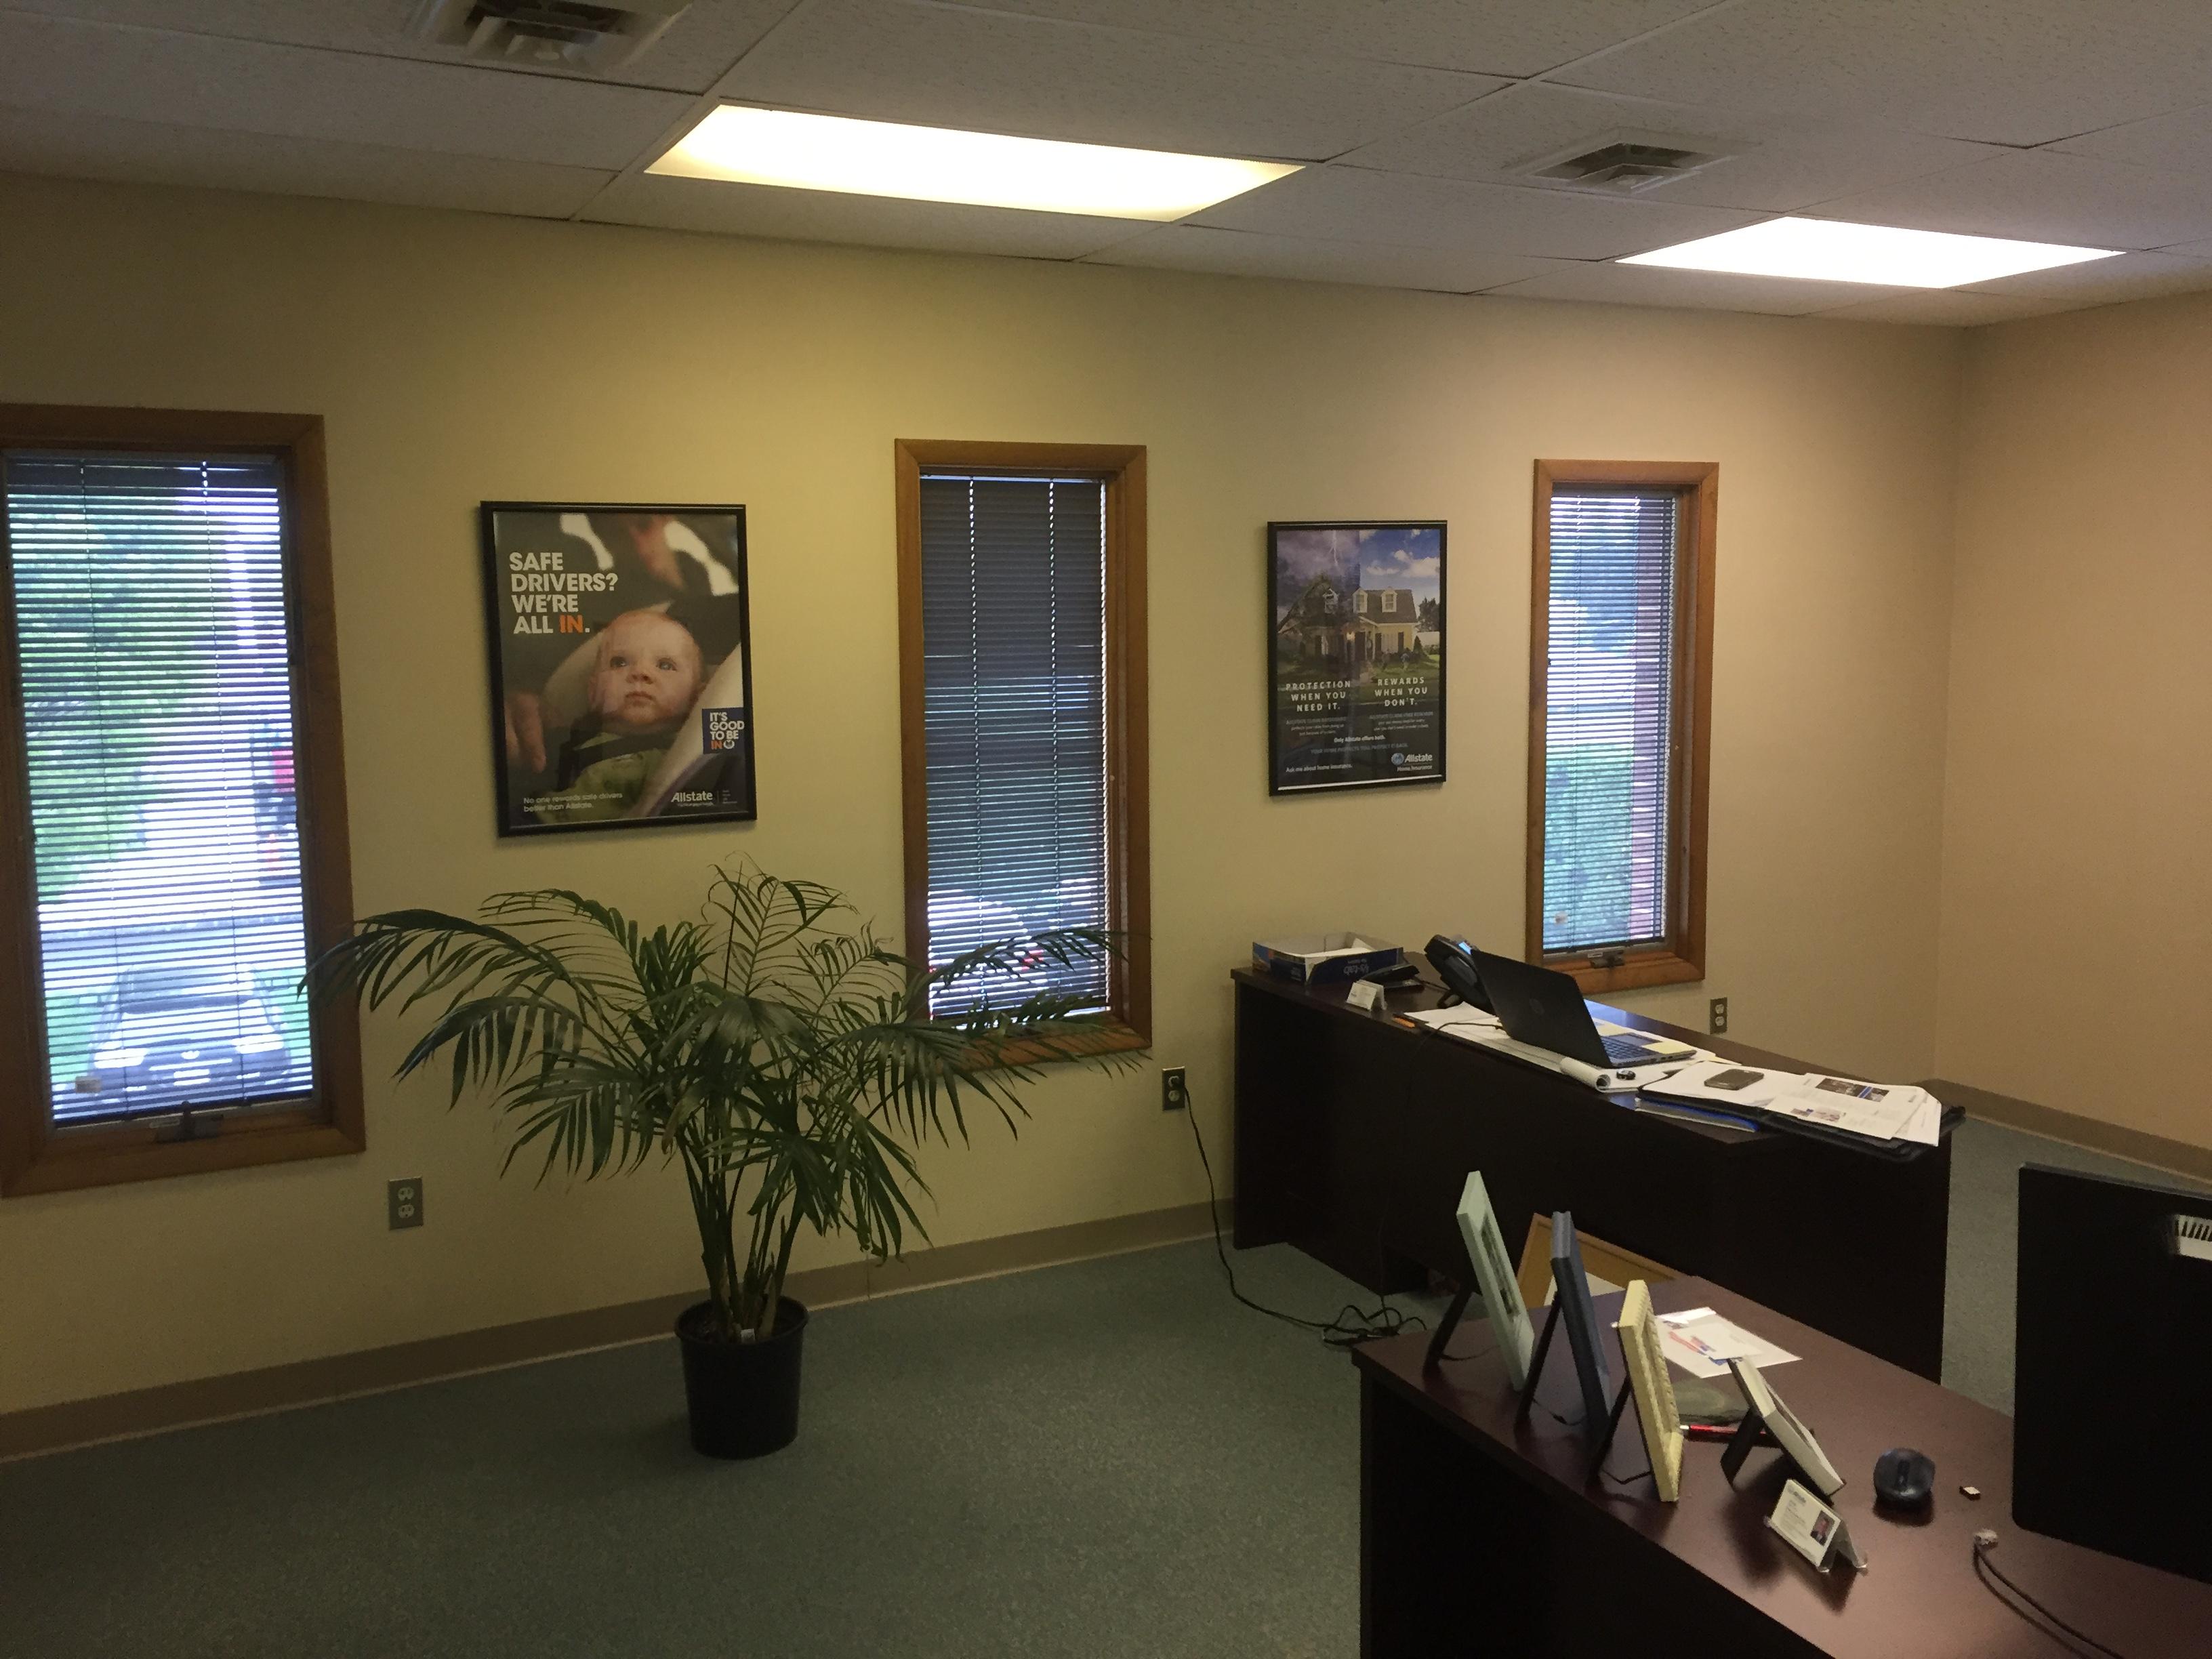 Patrick Boyle: Allstate Insurance image 1